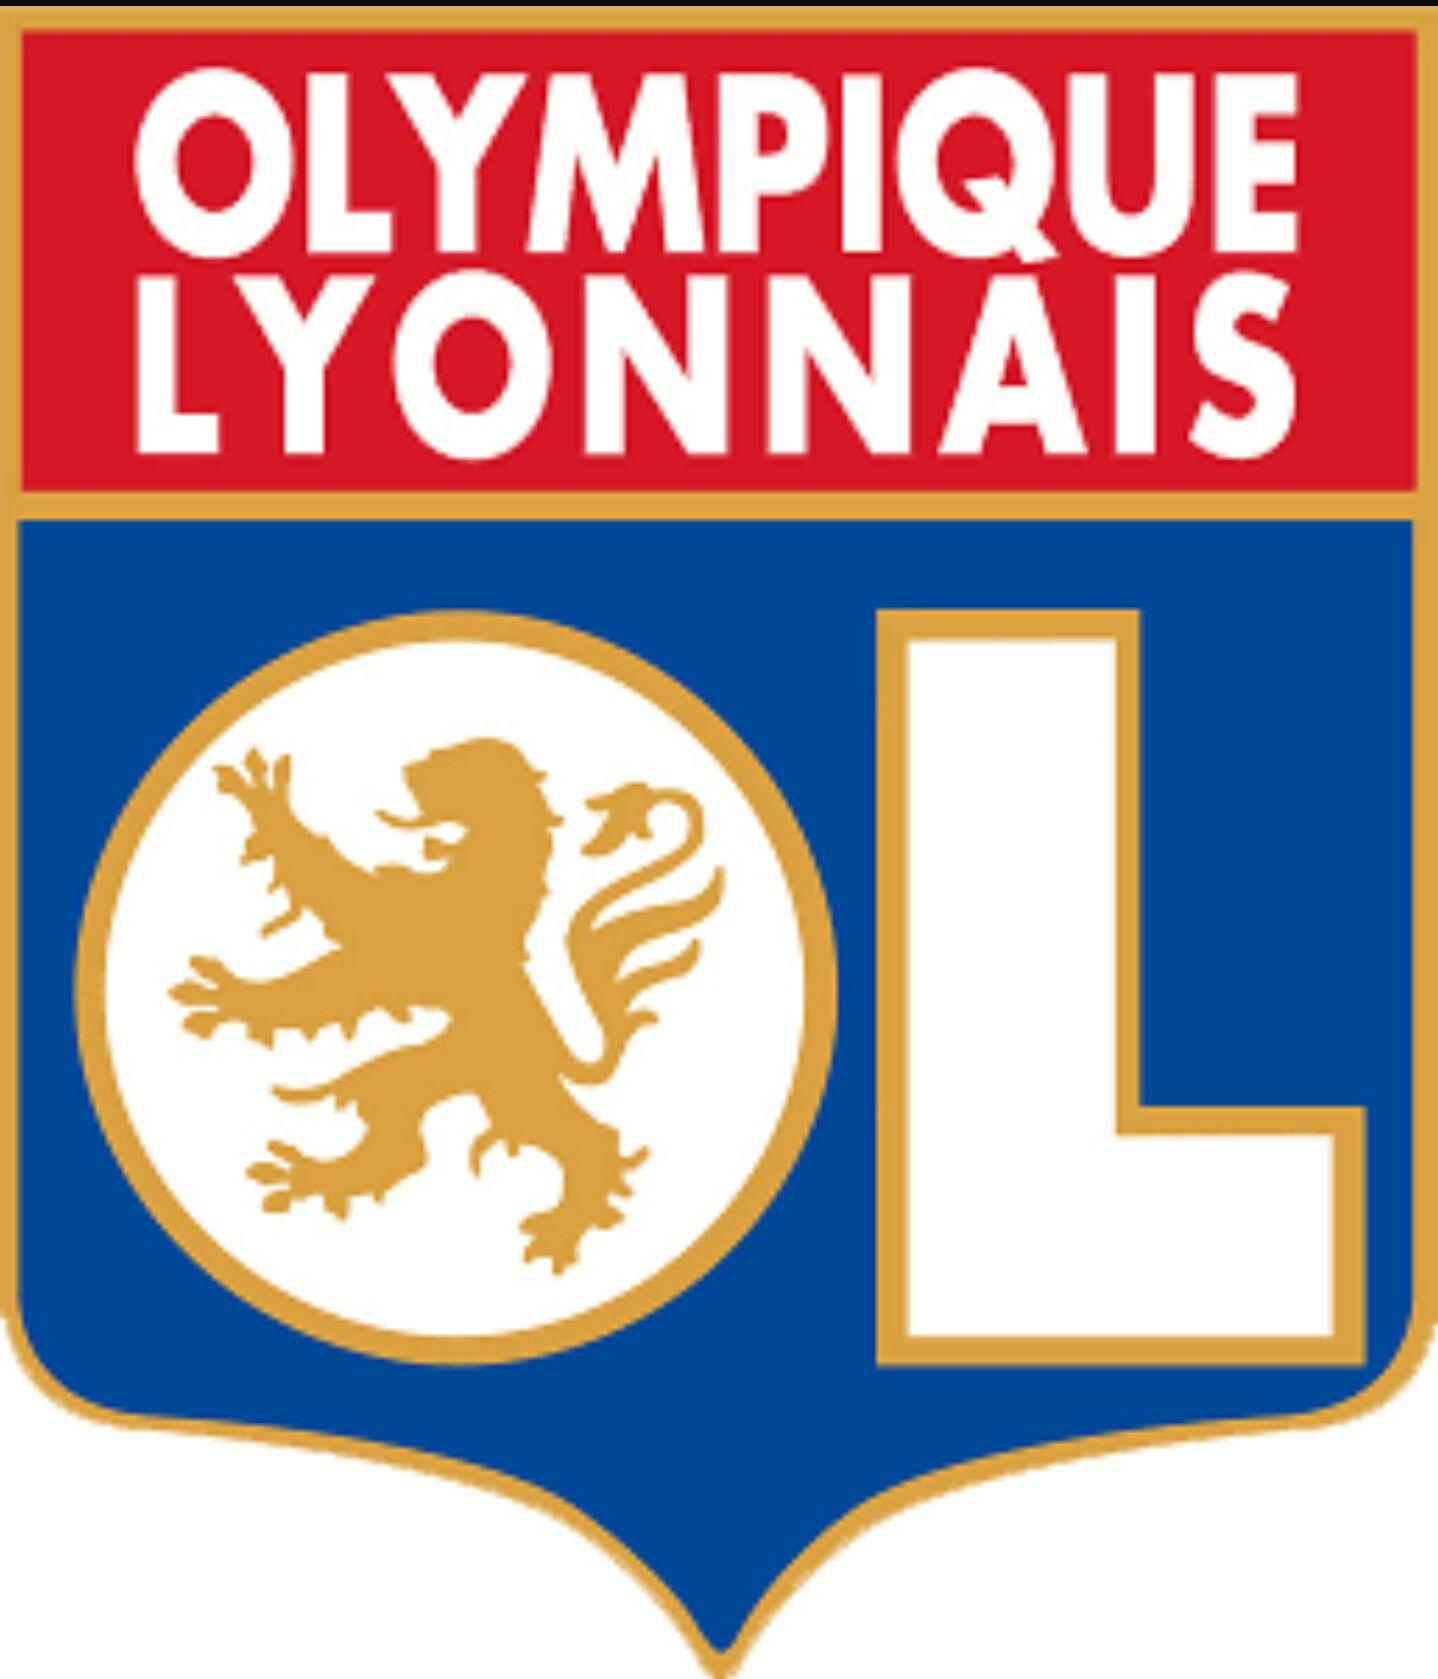 Olympique Lyonnais Lyon / França Football logo design